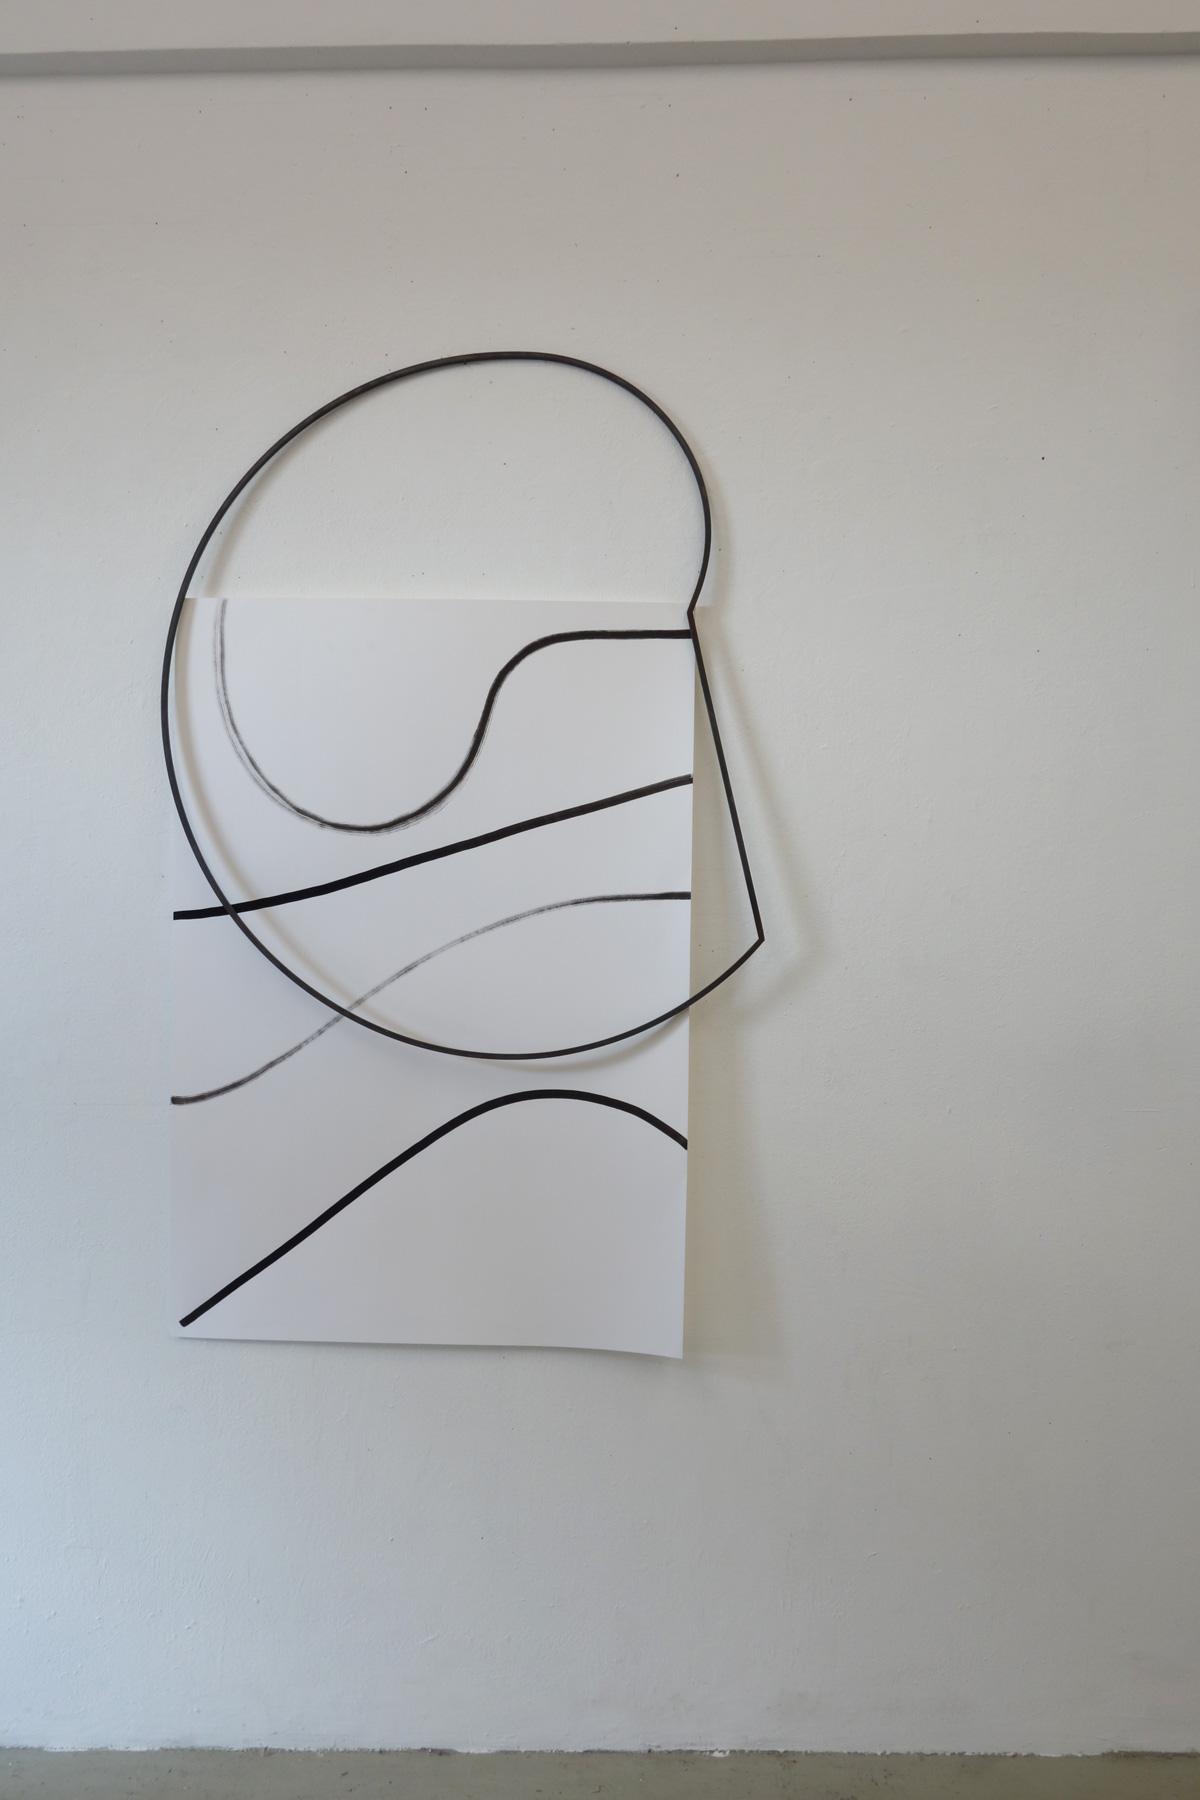 Nina Annabelle Märkl | Frames | Ink and steel drawing | 120 x 80 x 5 cm | 2018